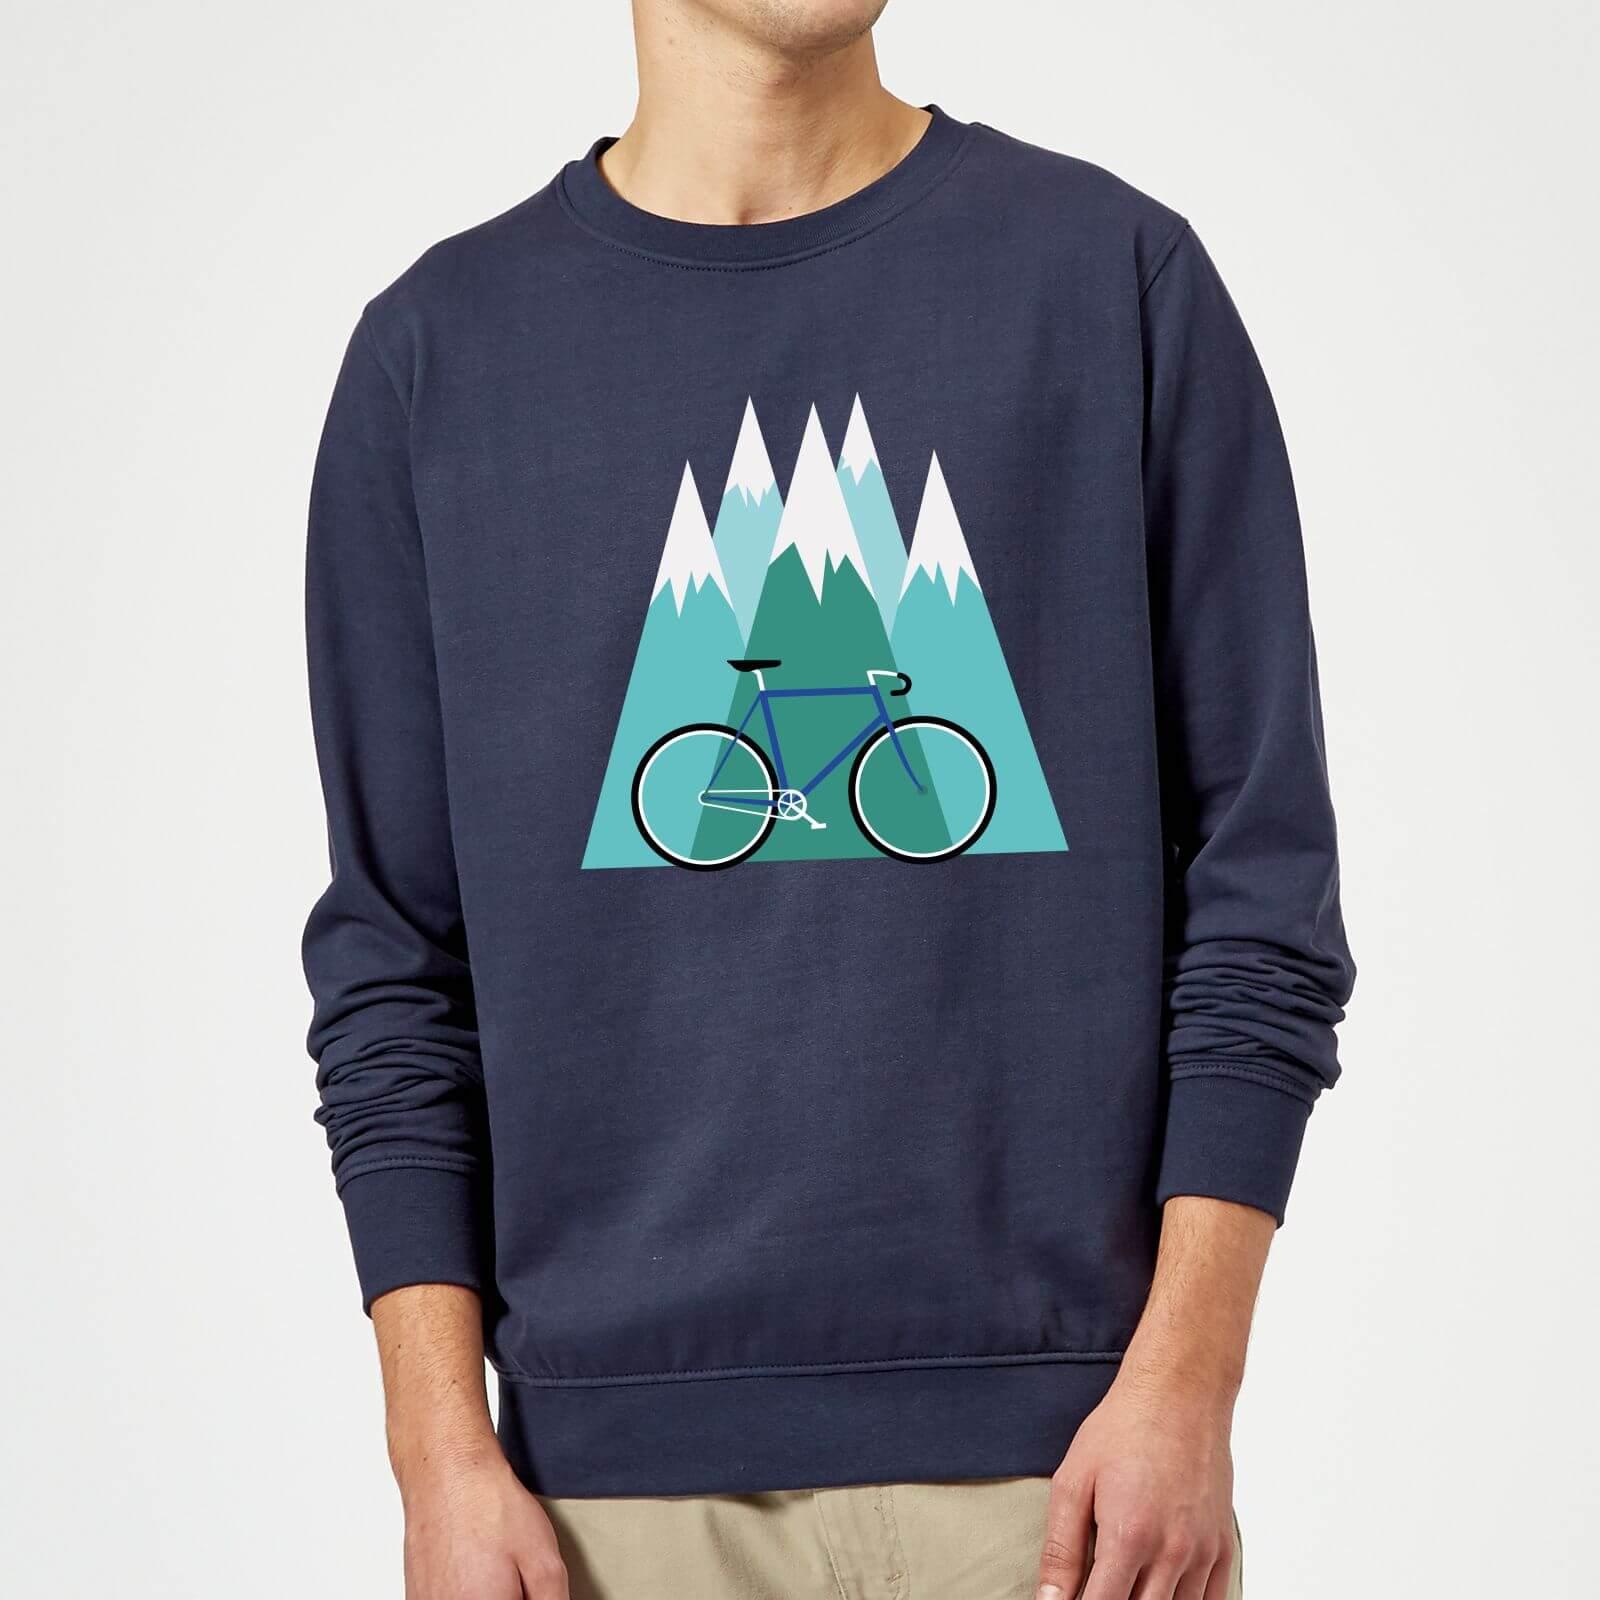 Bike And Mountains Christmas Sweatshirt - Navy - Xl - Navy